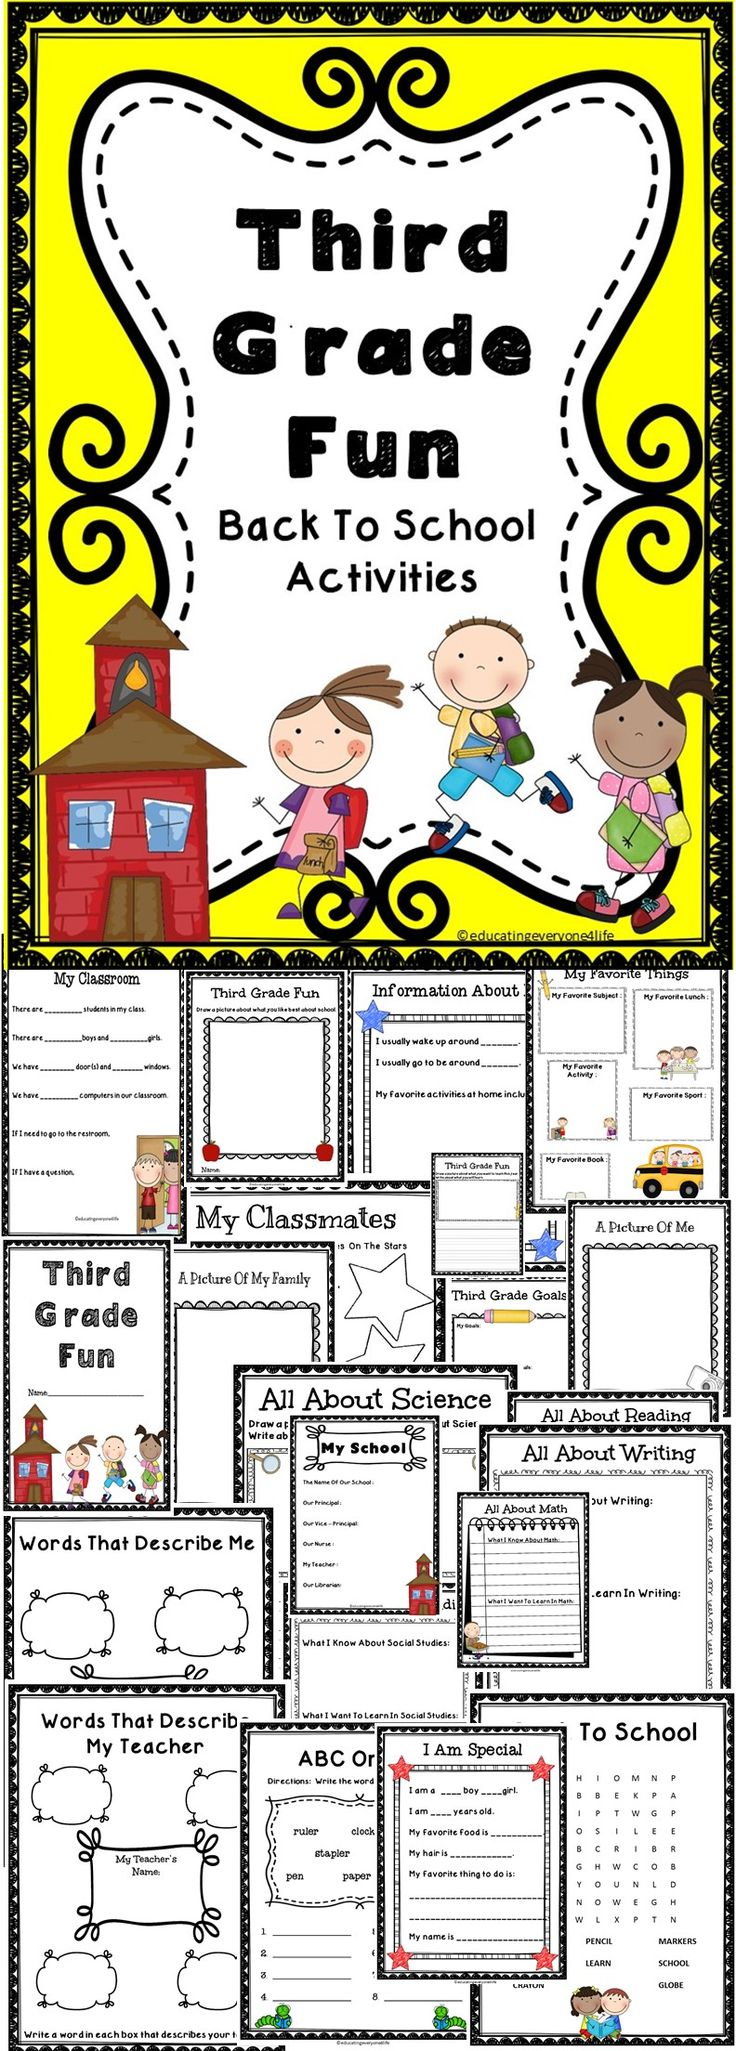 Third Grade Fun - A fun back to school activity book for third graders. #education